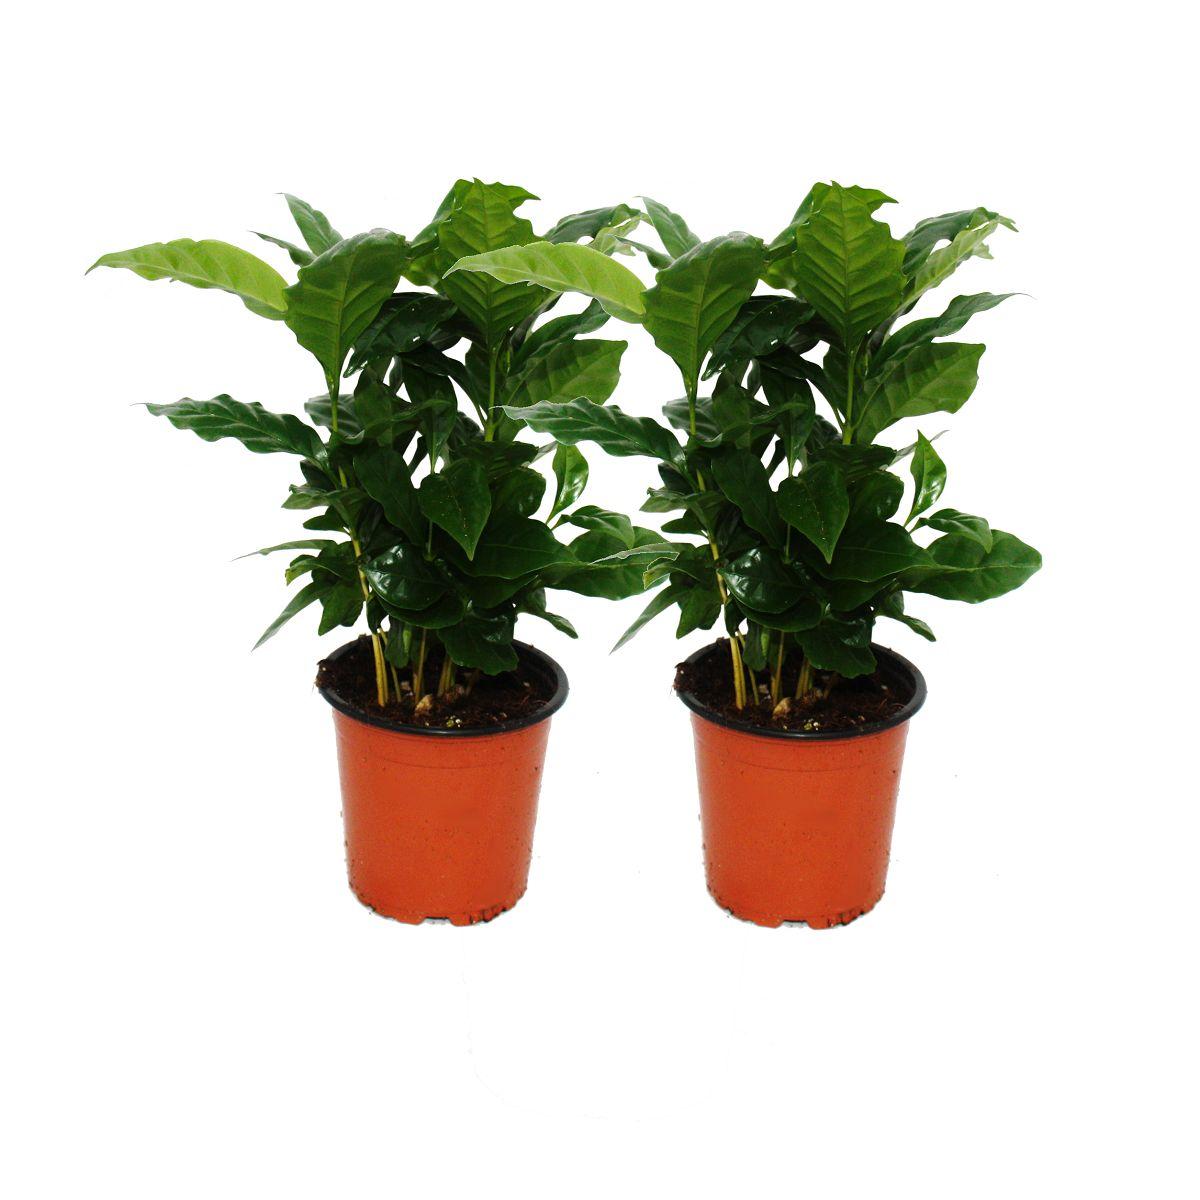 kaffee pflanze coffea arabica 2 pflanze zimmerpflanze. Black Bedroom Furniture Sets. Home Design Ideas